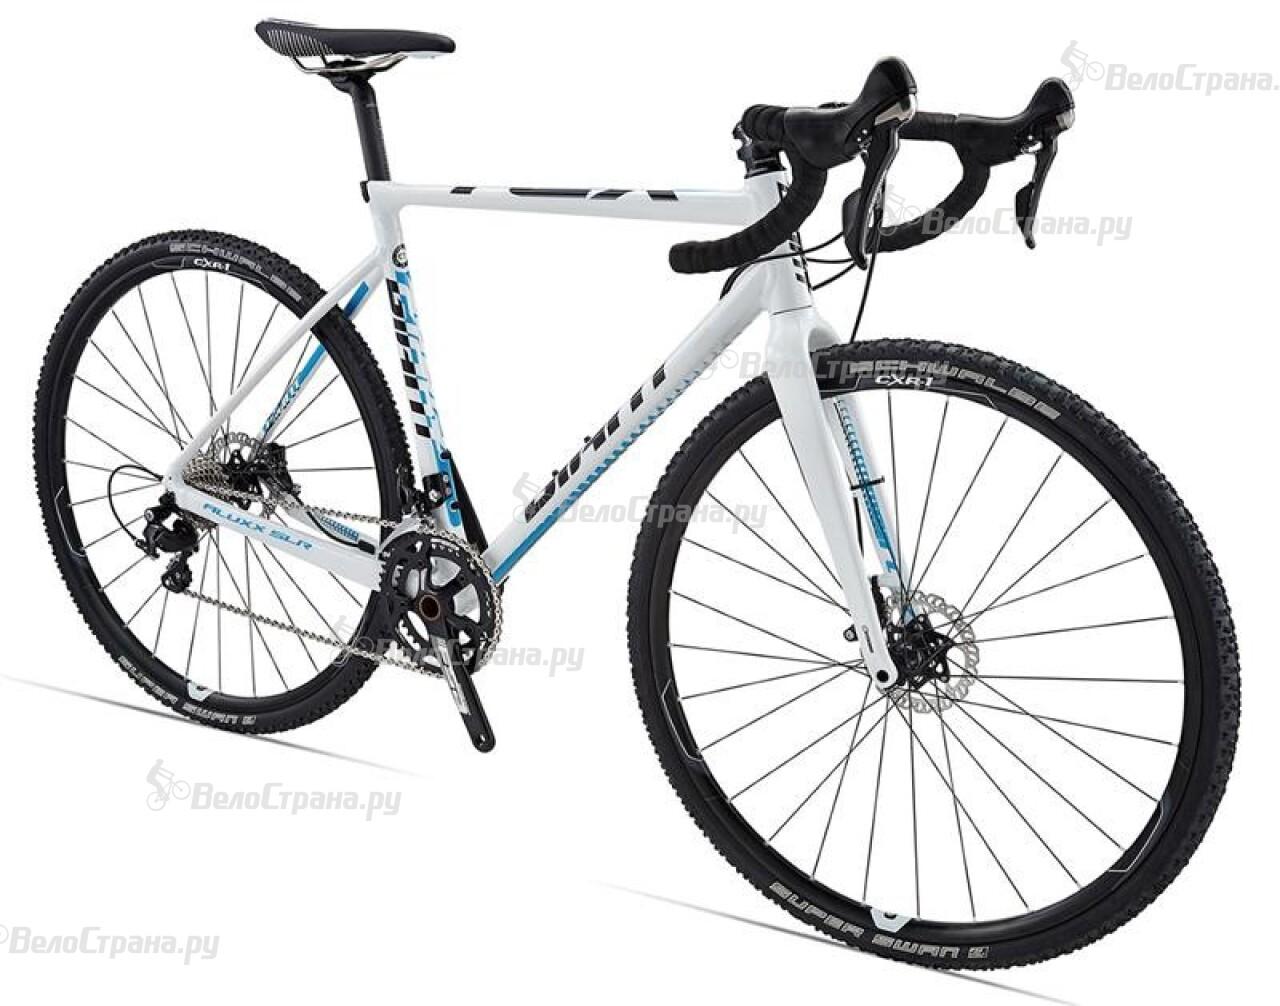 все цены на Велосипед Giant TCX SLR 1 (2015) онлайн